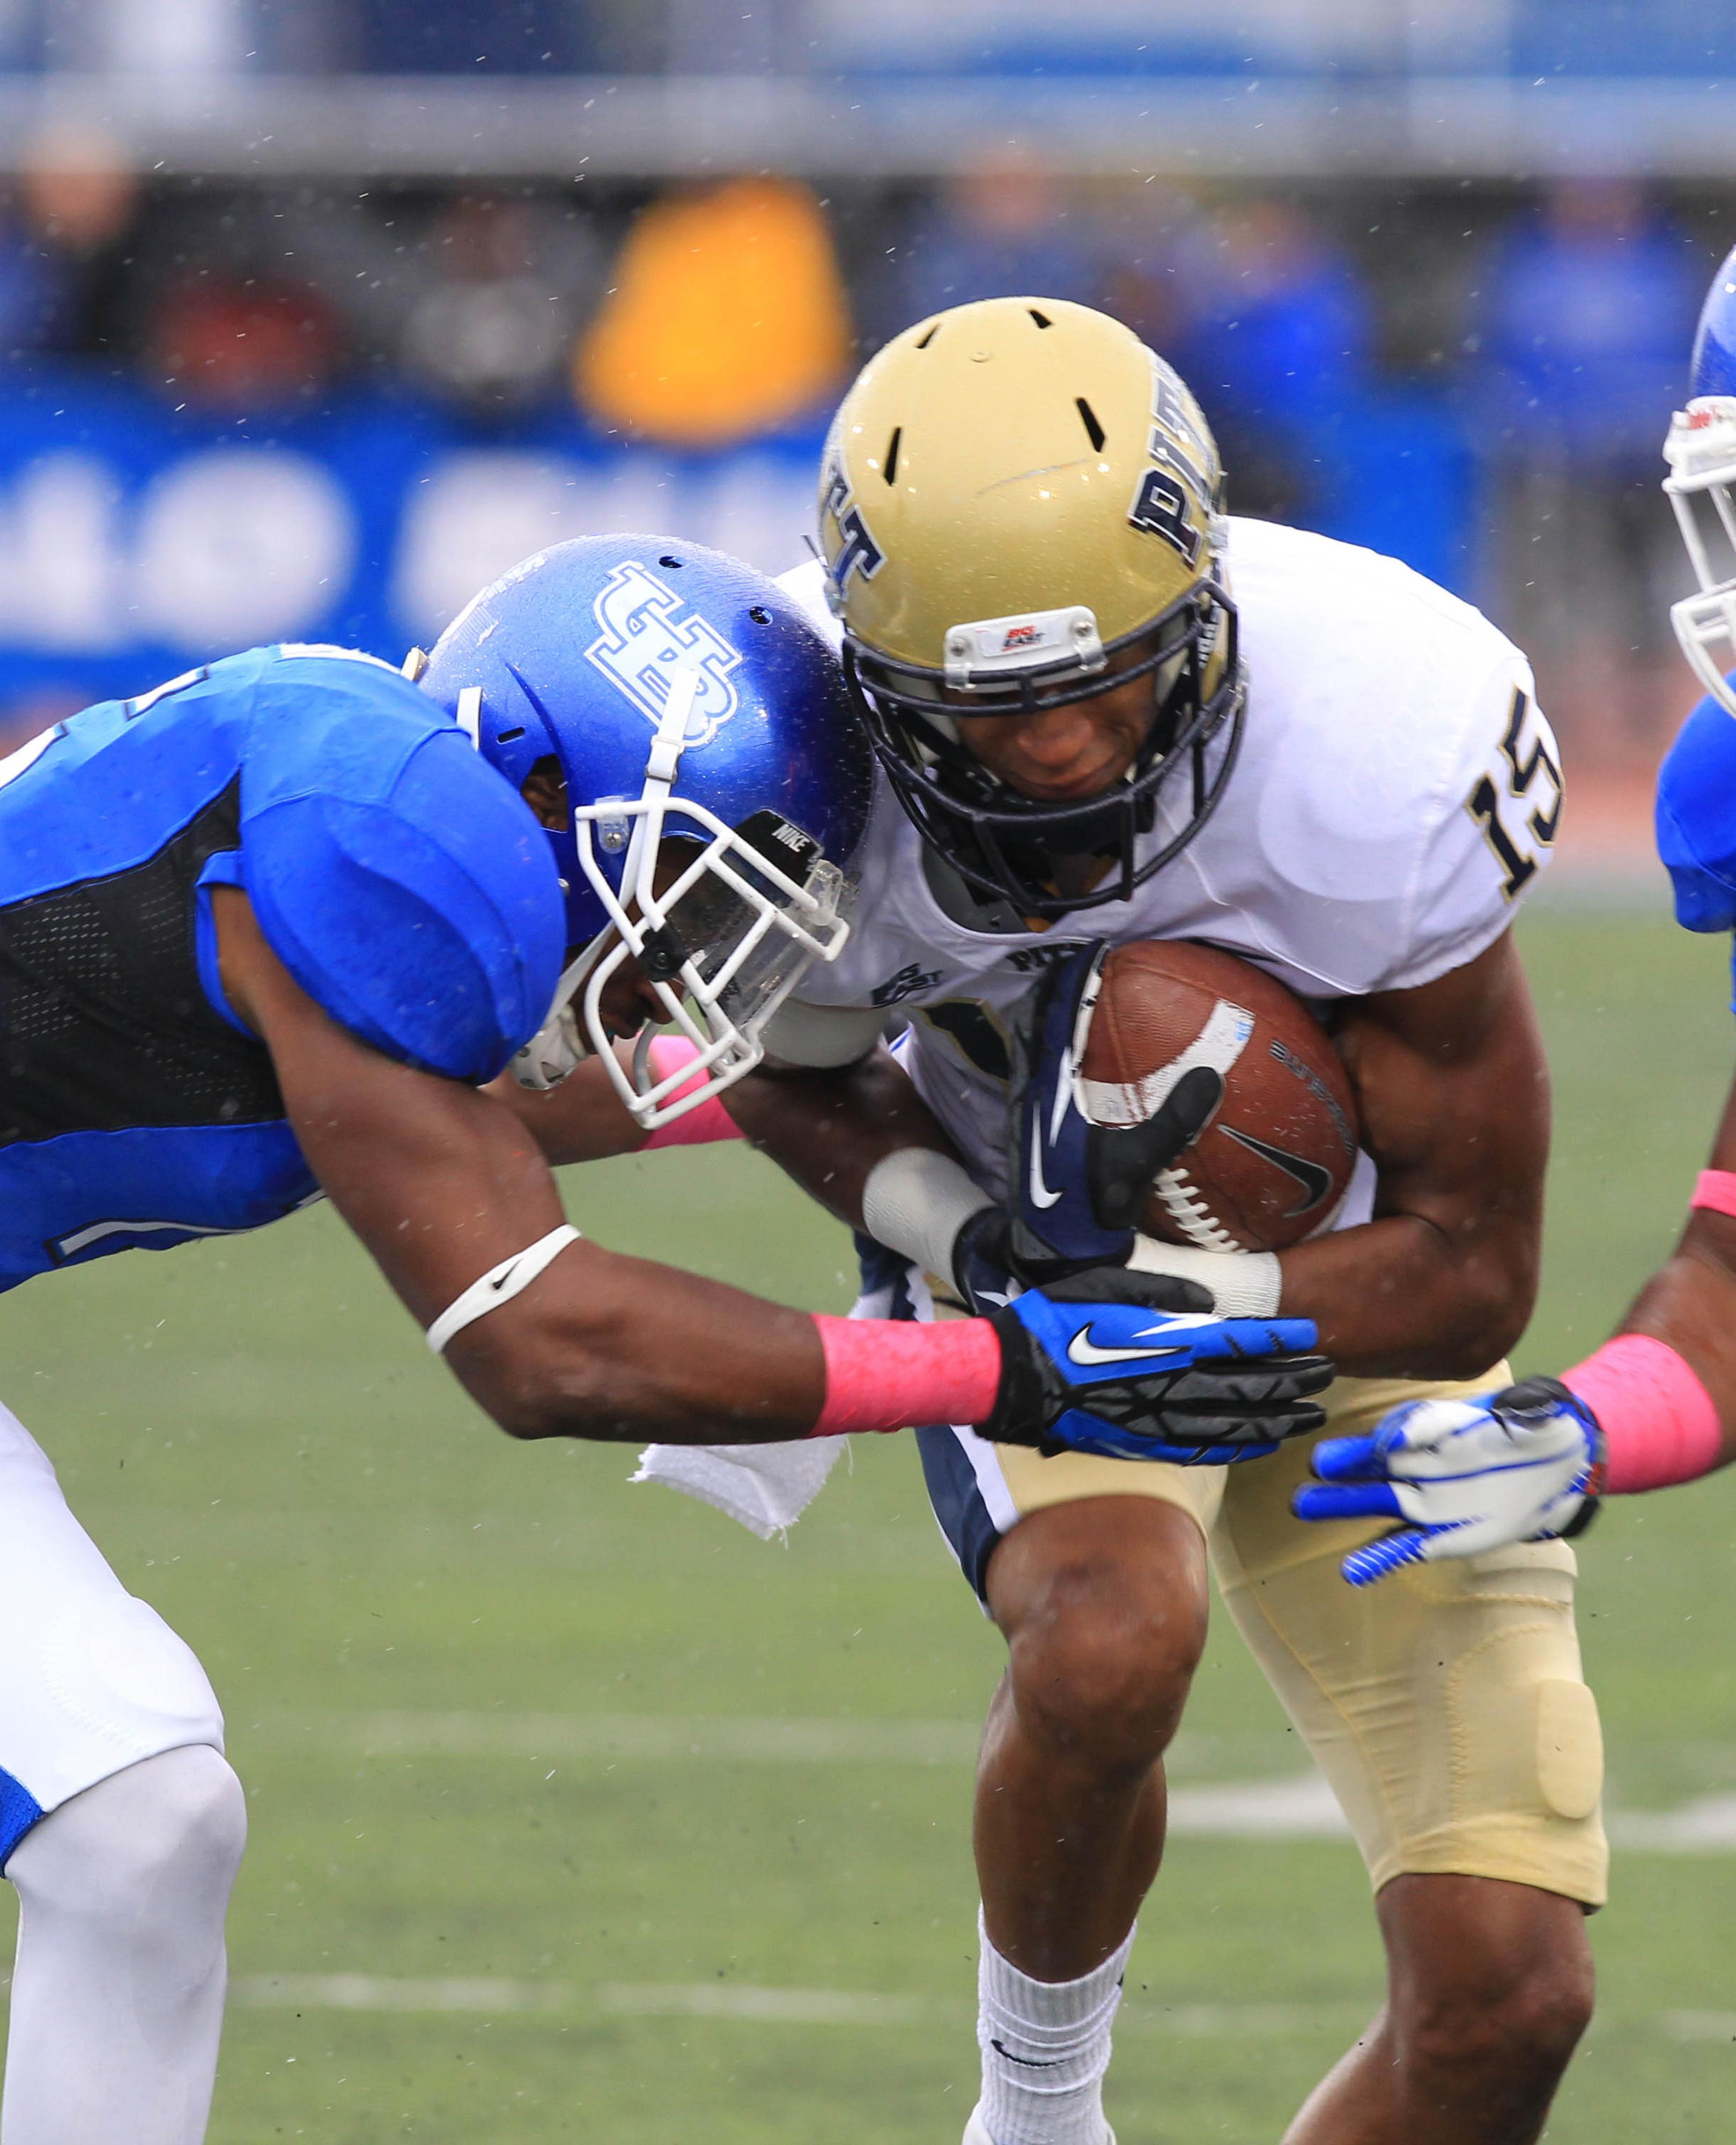 Buffalo linebacker Khalil Mack earns watch list honors Monday.